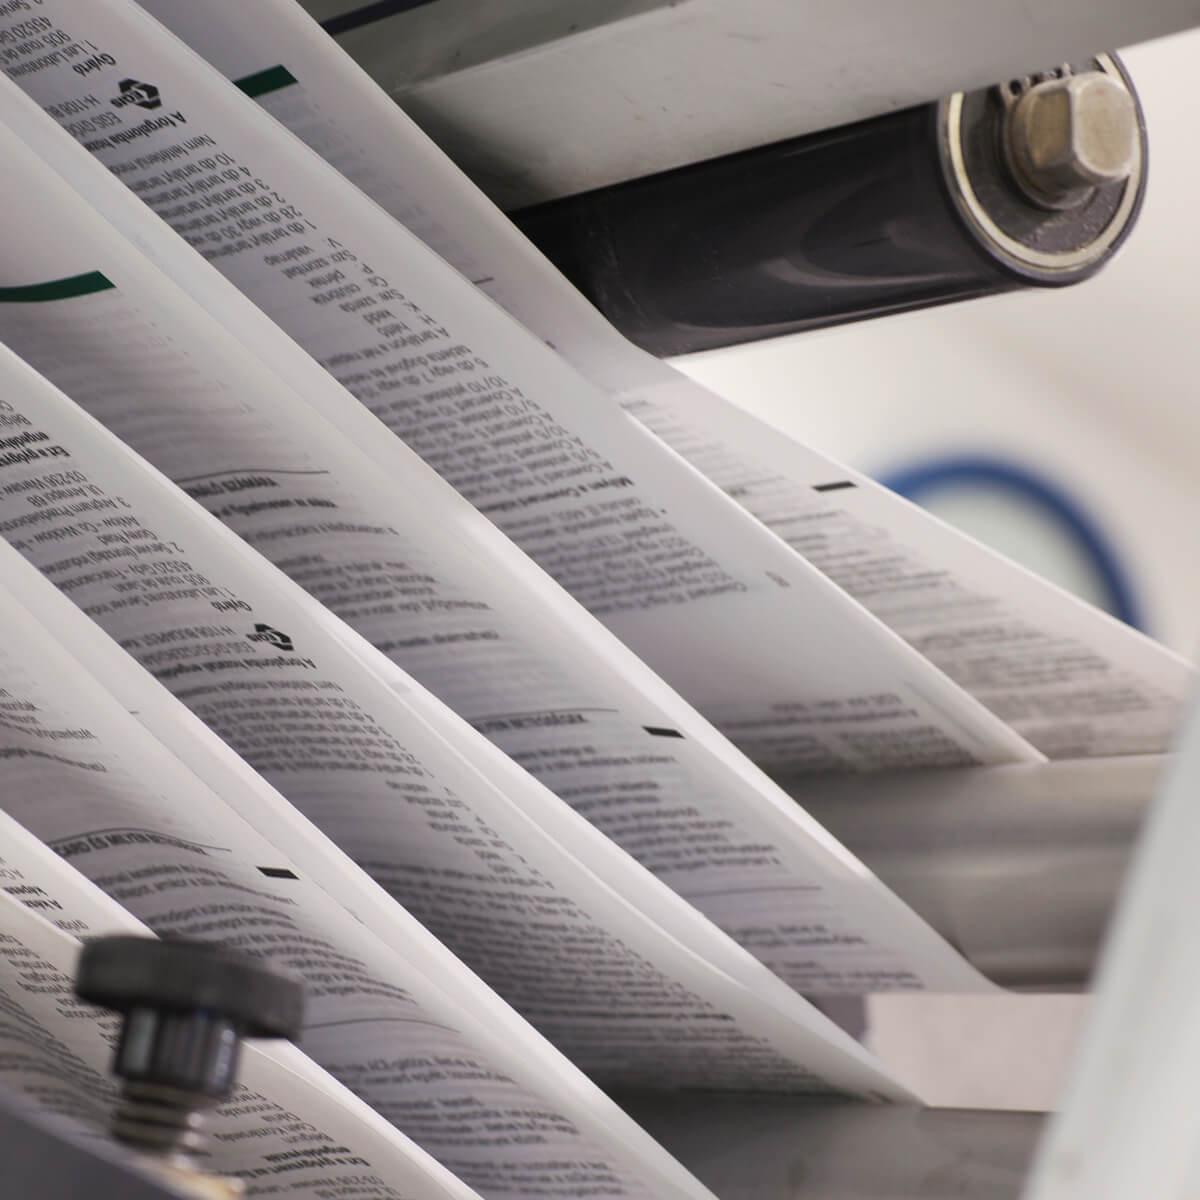 Pharma leaflet print quality, pharmaceutical leaflet verification, PDF compare